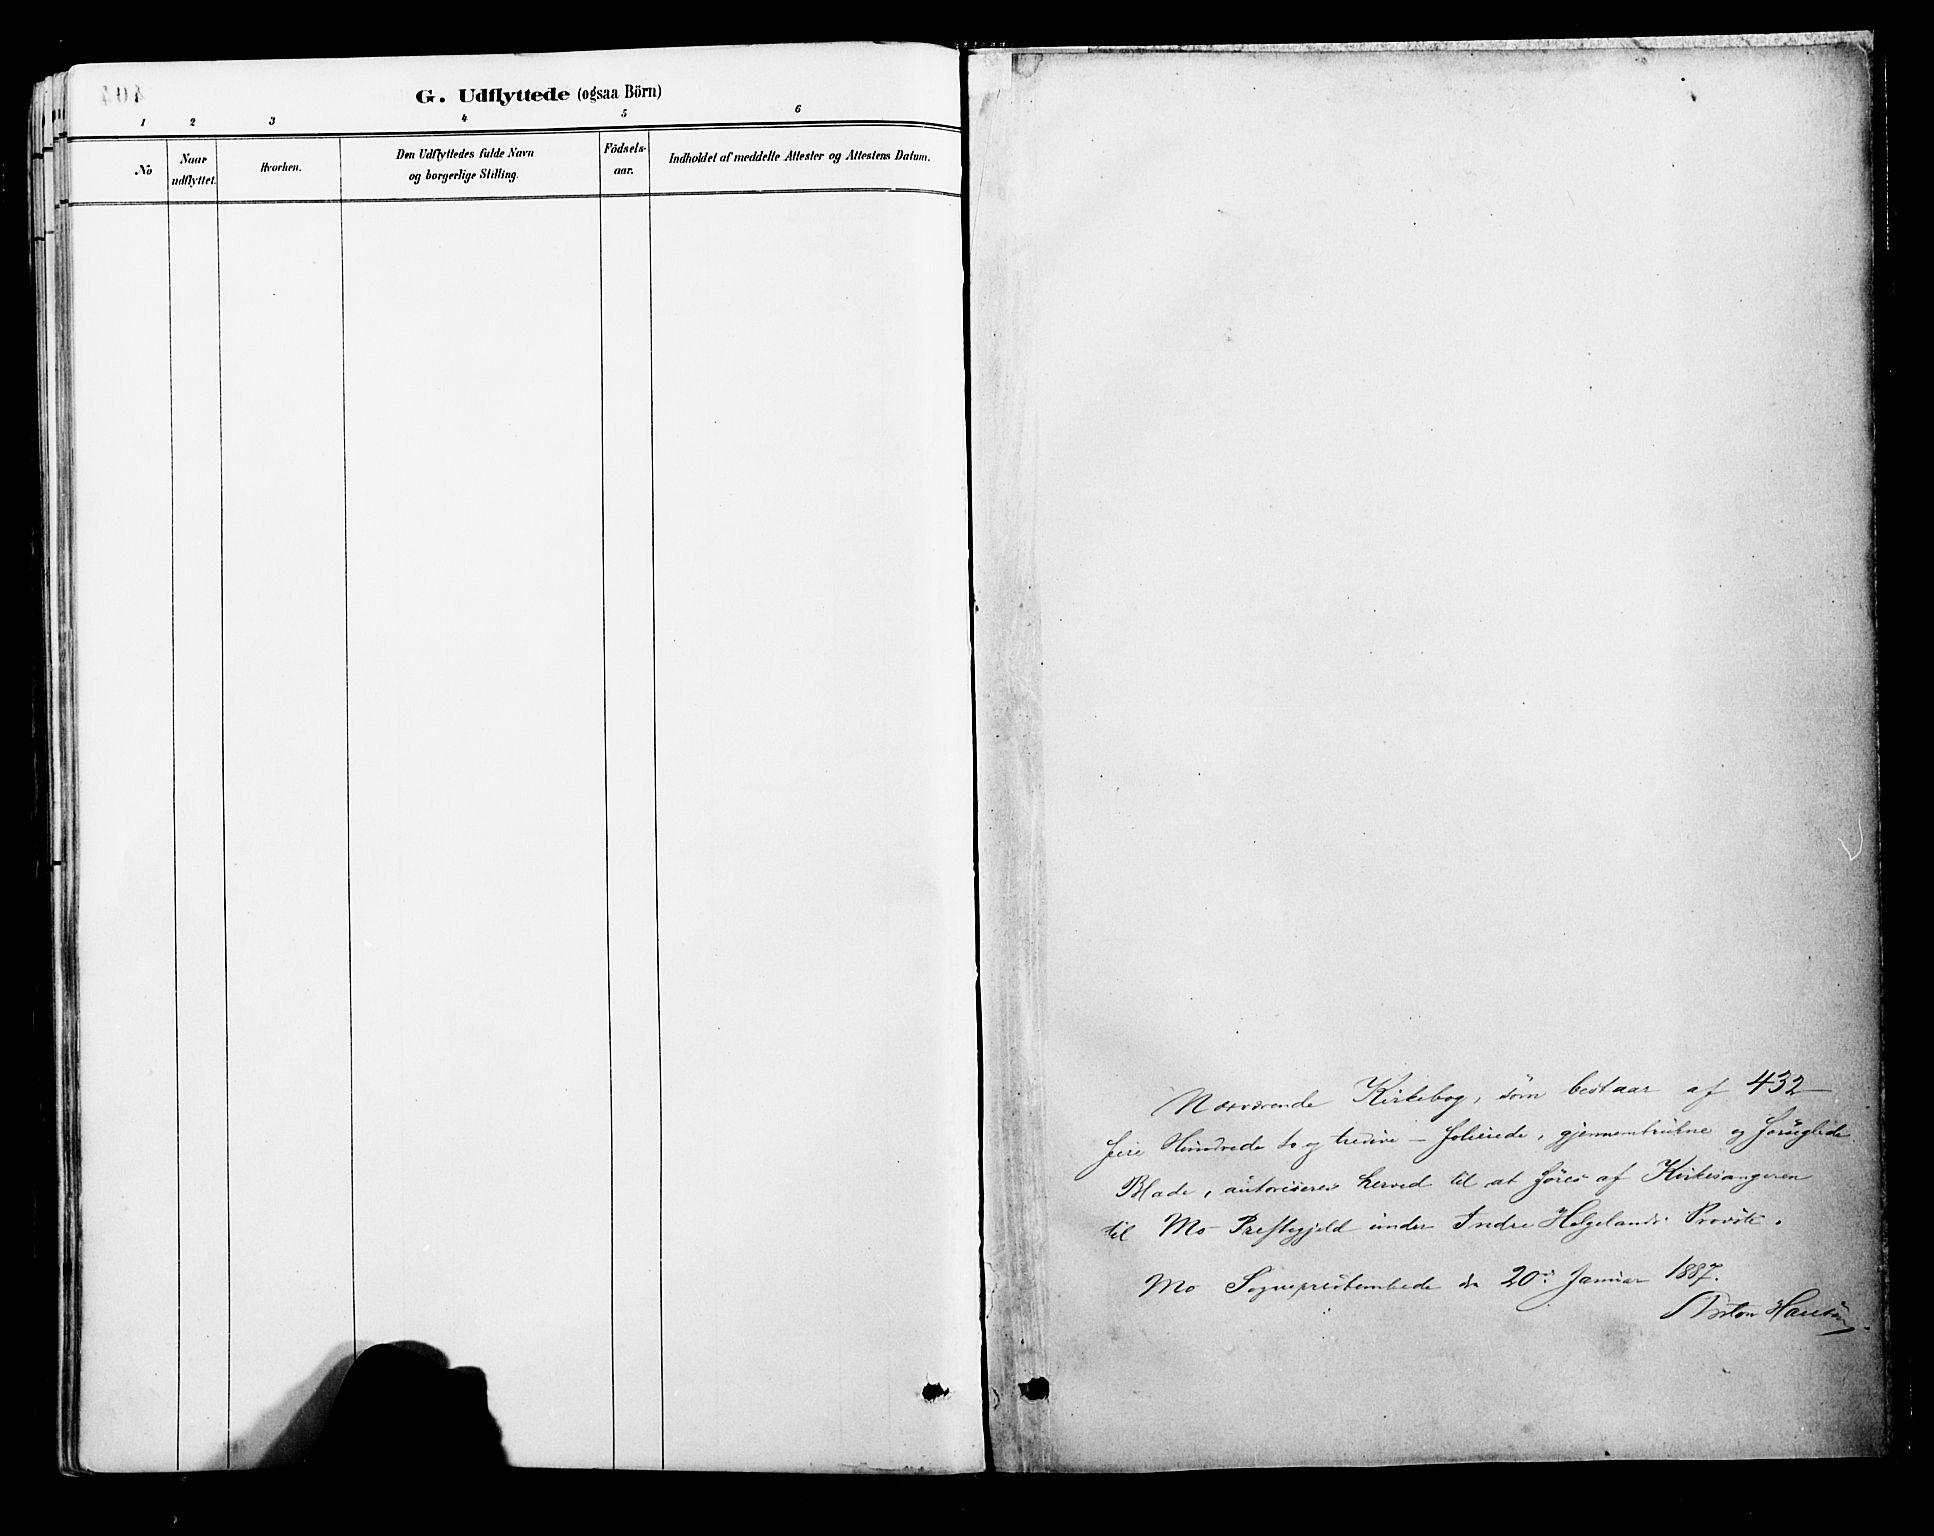 SAT, Ministerialprotokoller, klokkerbøker og fødselsregistre - Nordland, 827/L0421: Klokkerbok nr. 827C10, 1887-1906